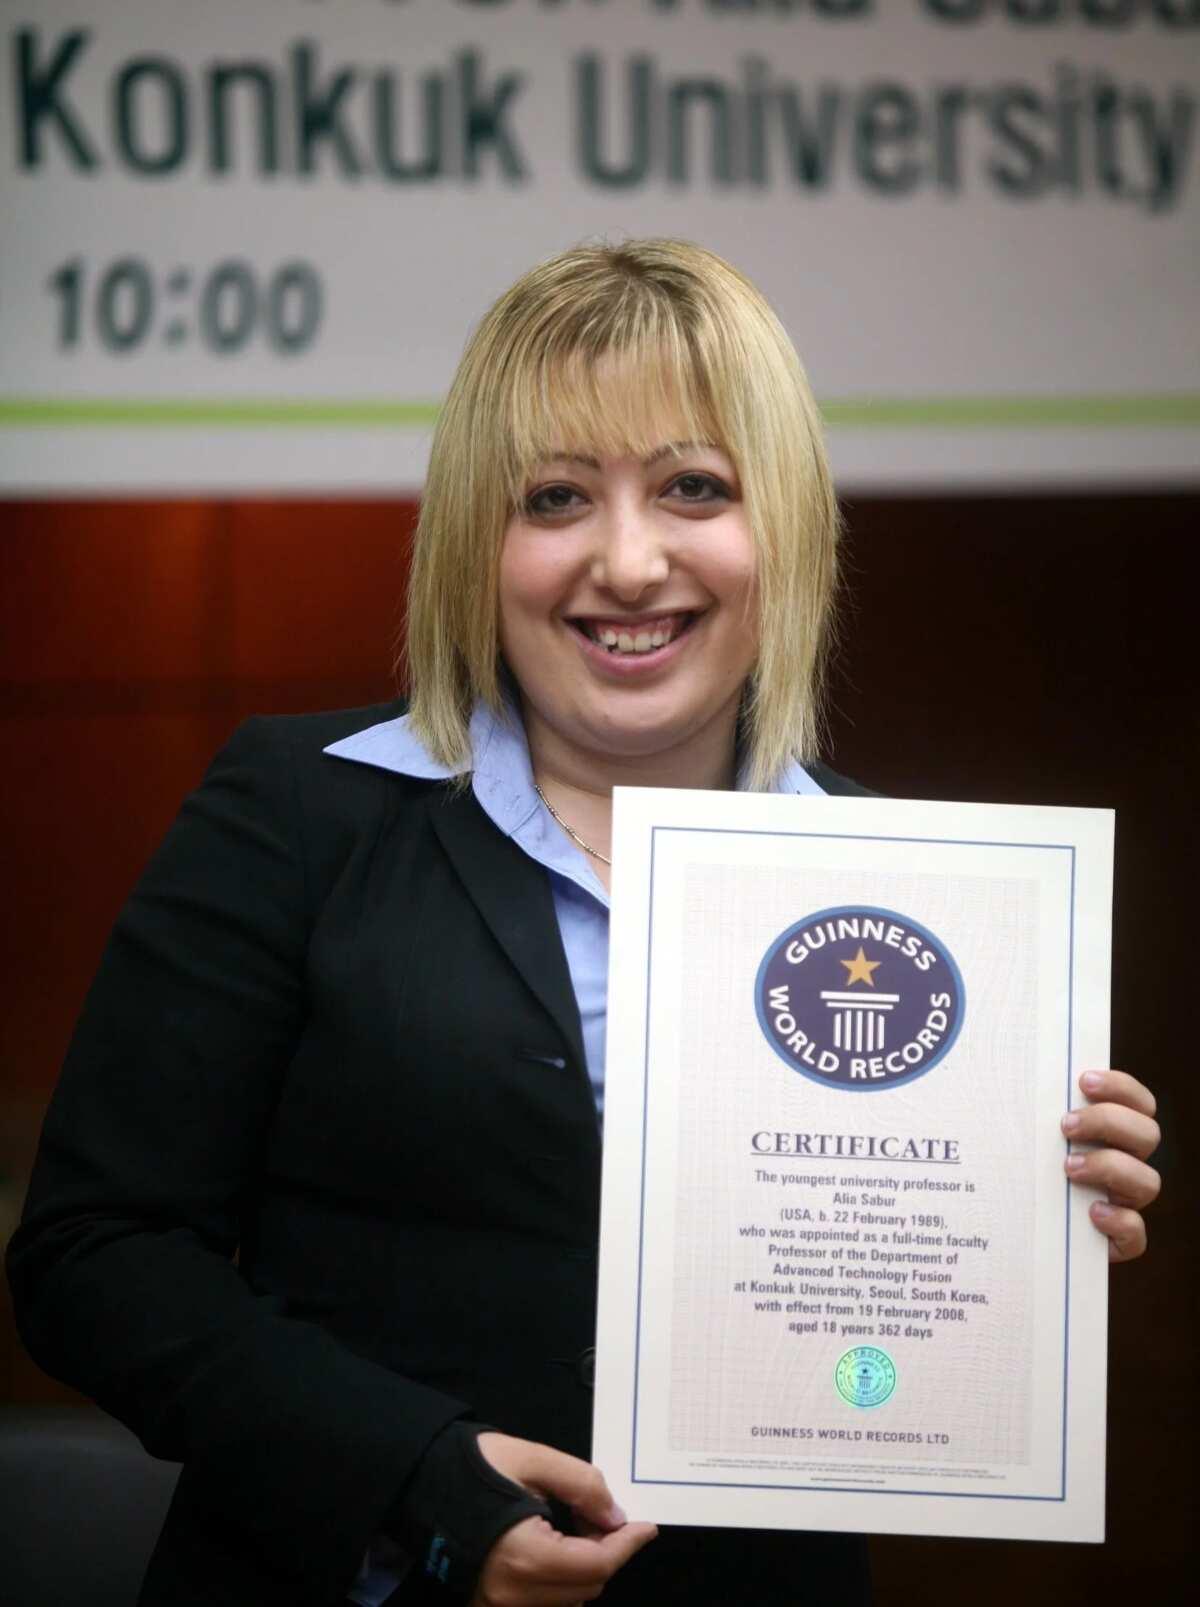 Alia Sabur in Konkuk University